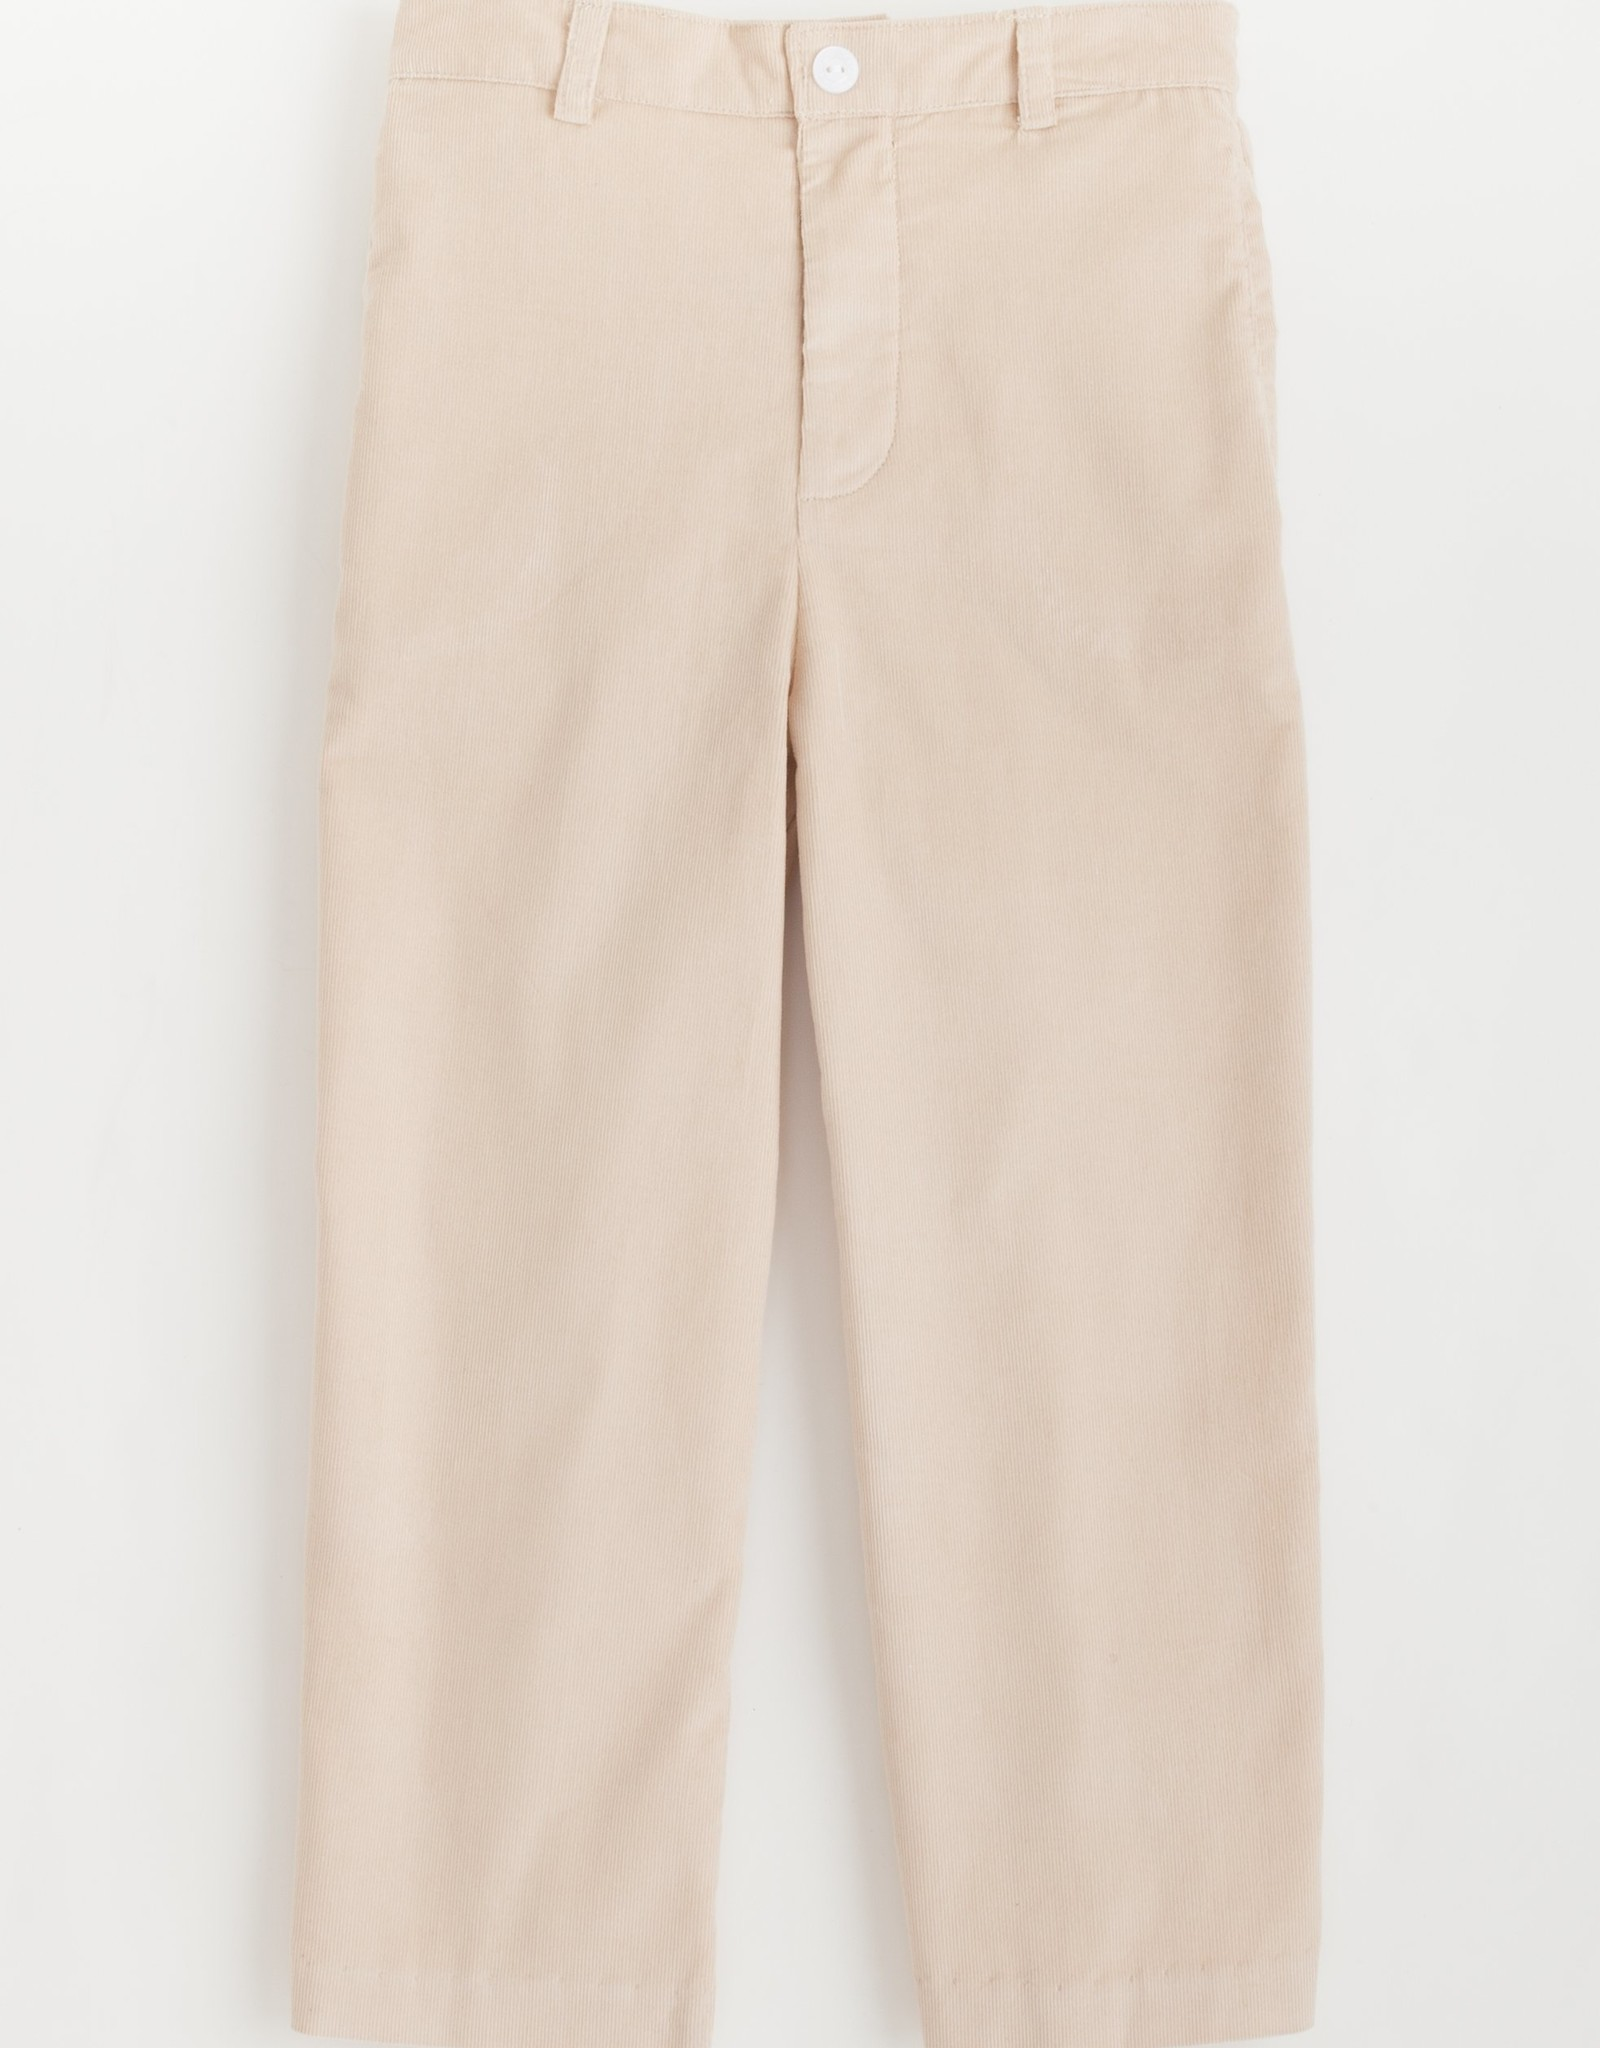 Little English Tan Corduroy Pull On Pant